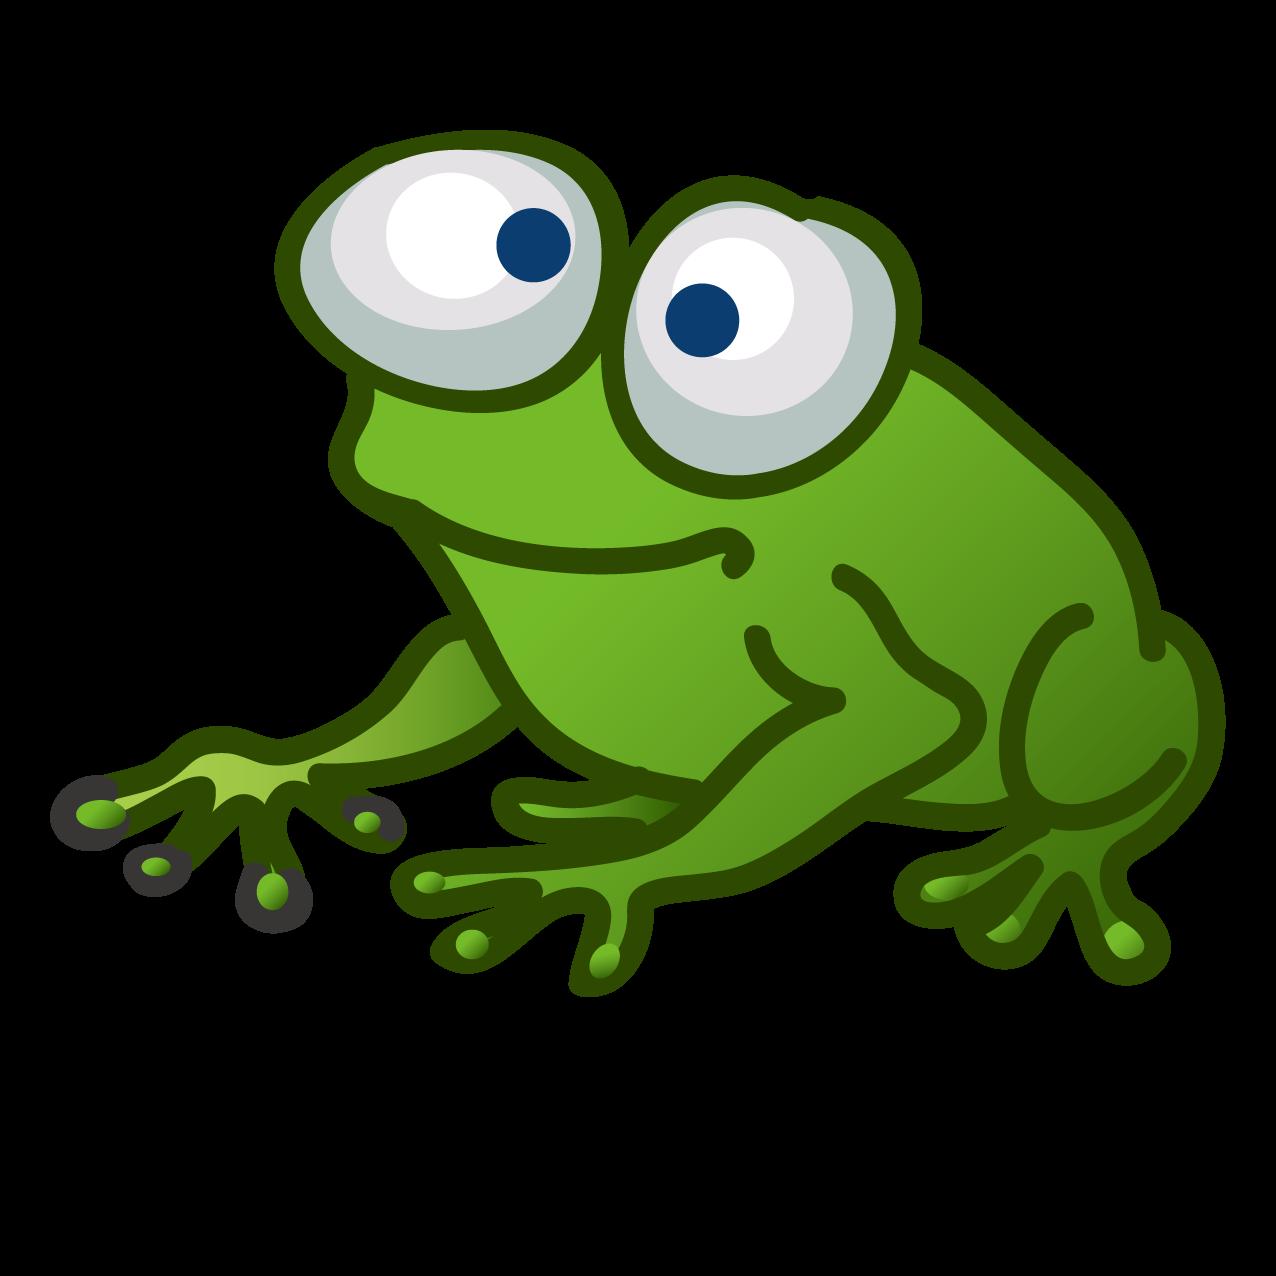 True frog toad edible. Frogs clipart bullfrog